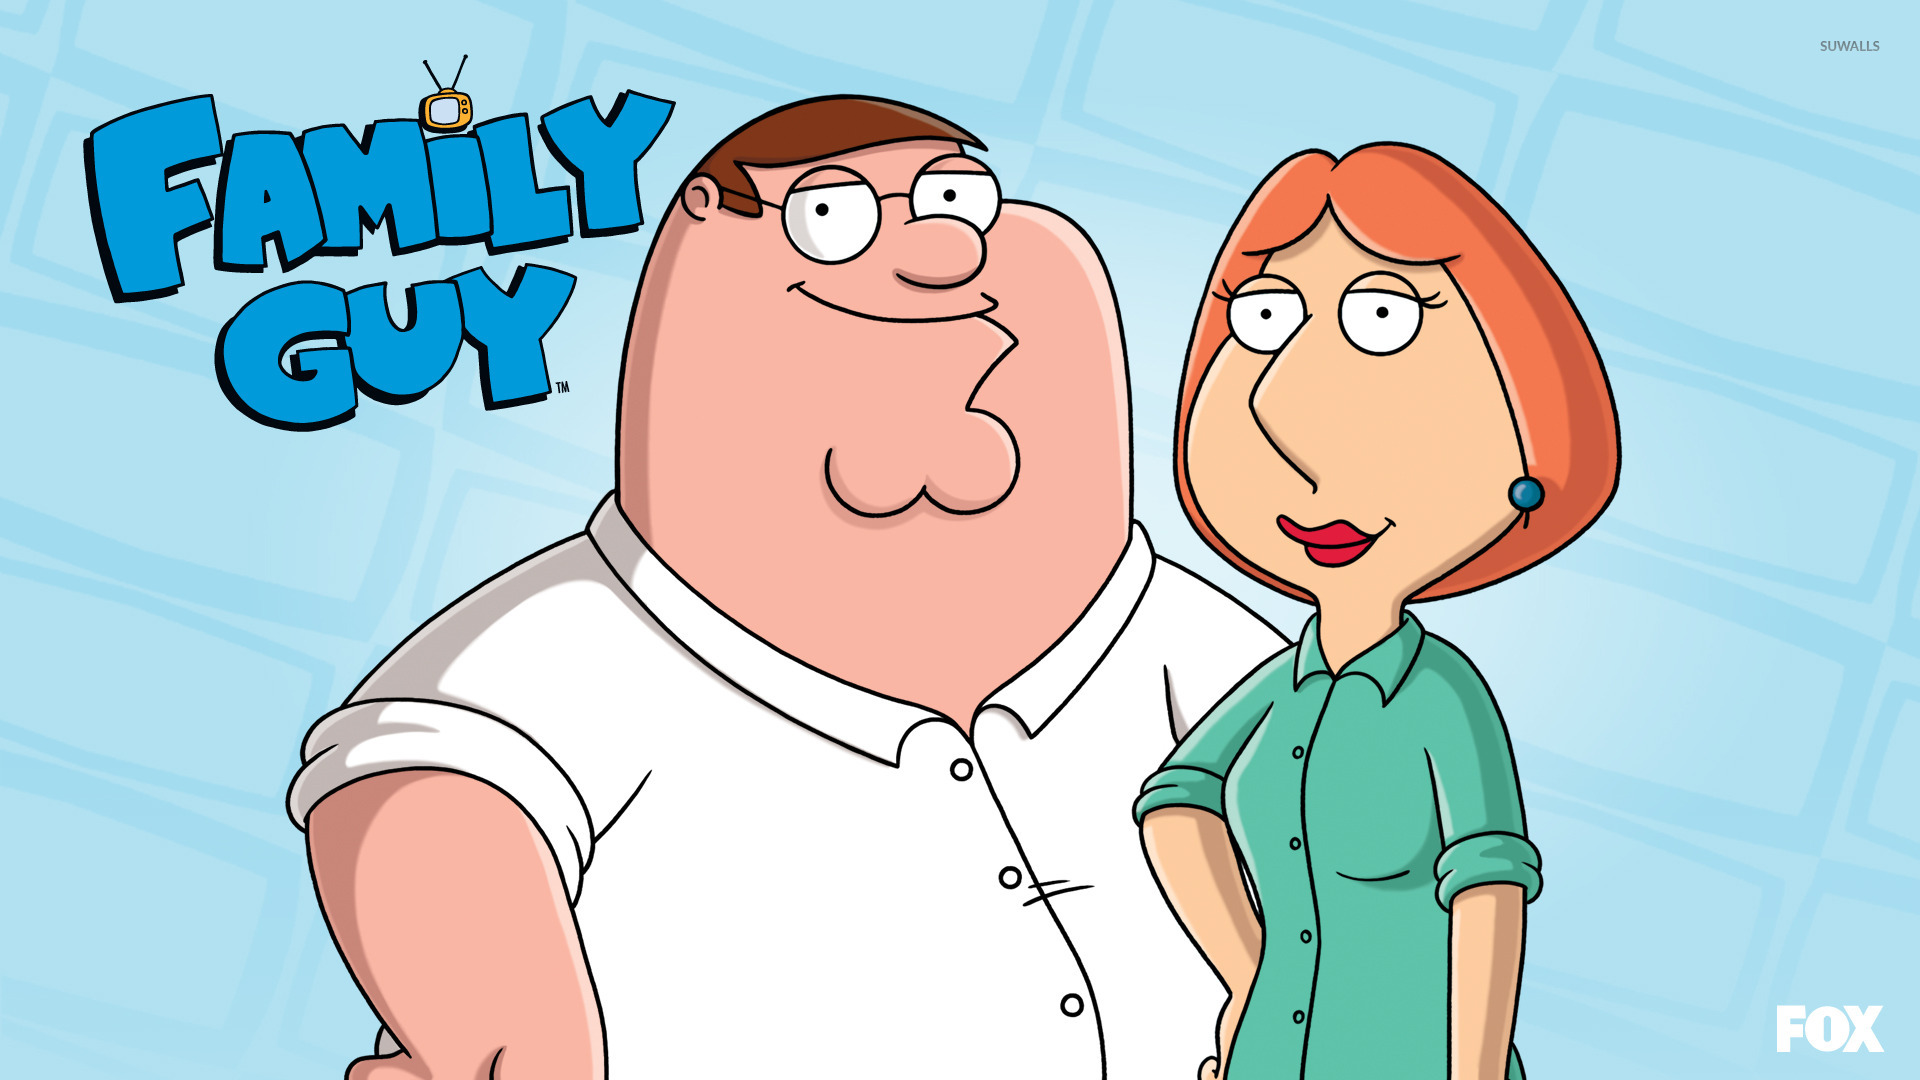 Evil Monkey Family Guy Wallpaper Cartoon Wallpapers 28864